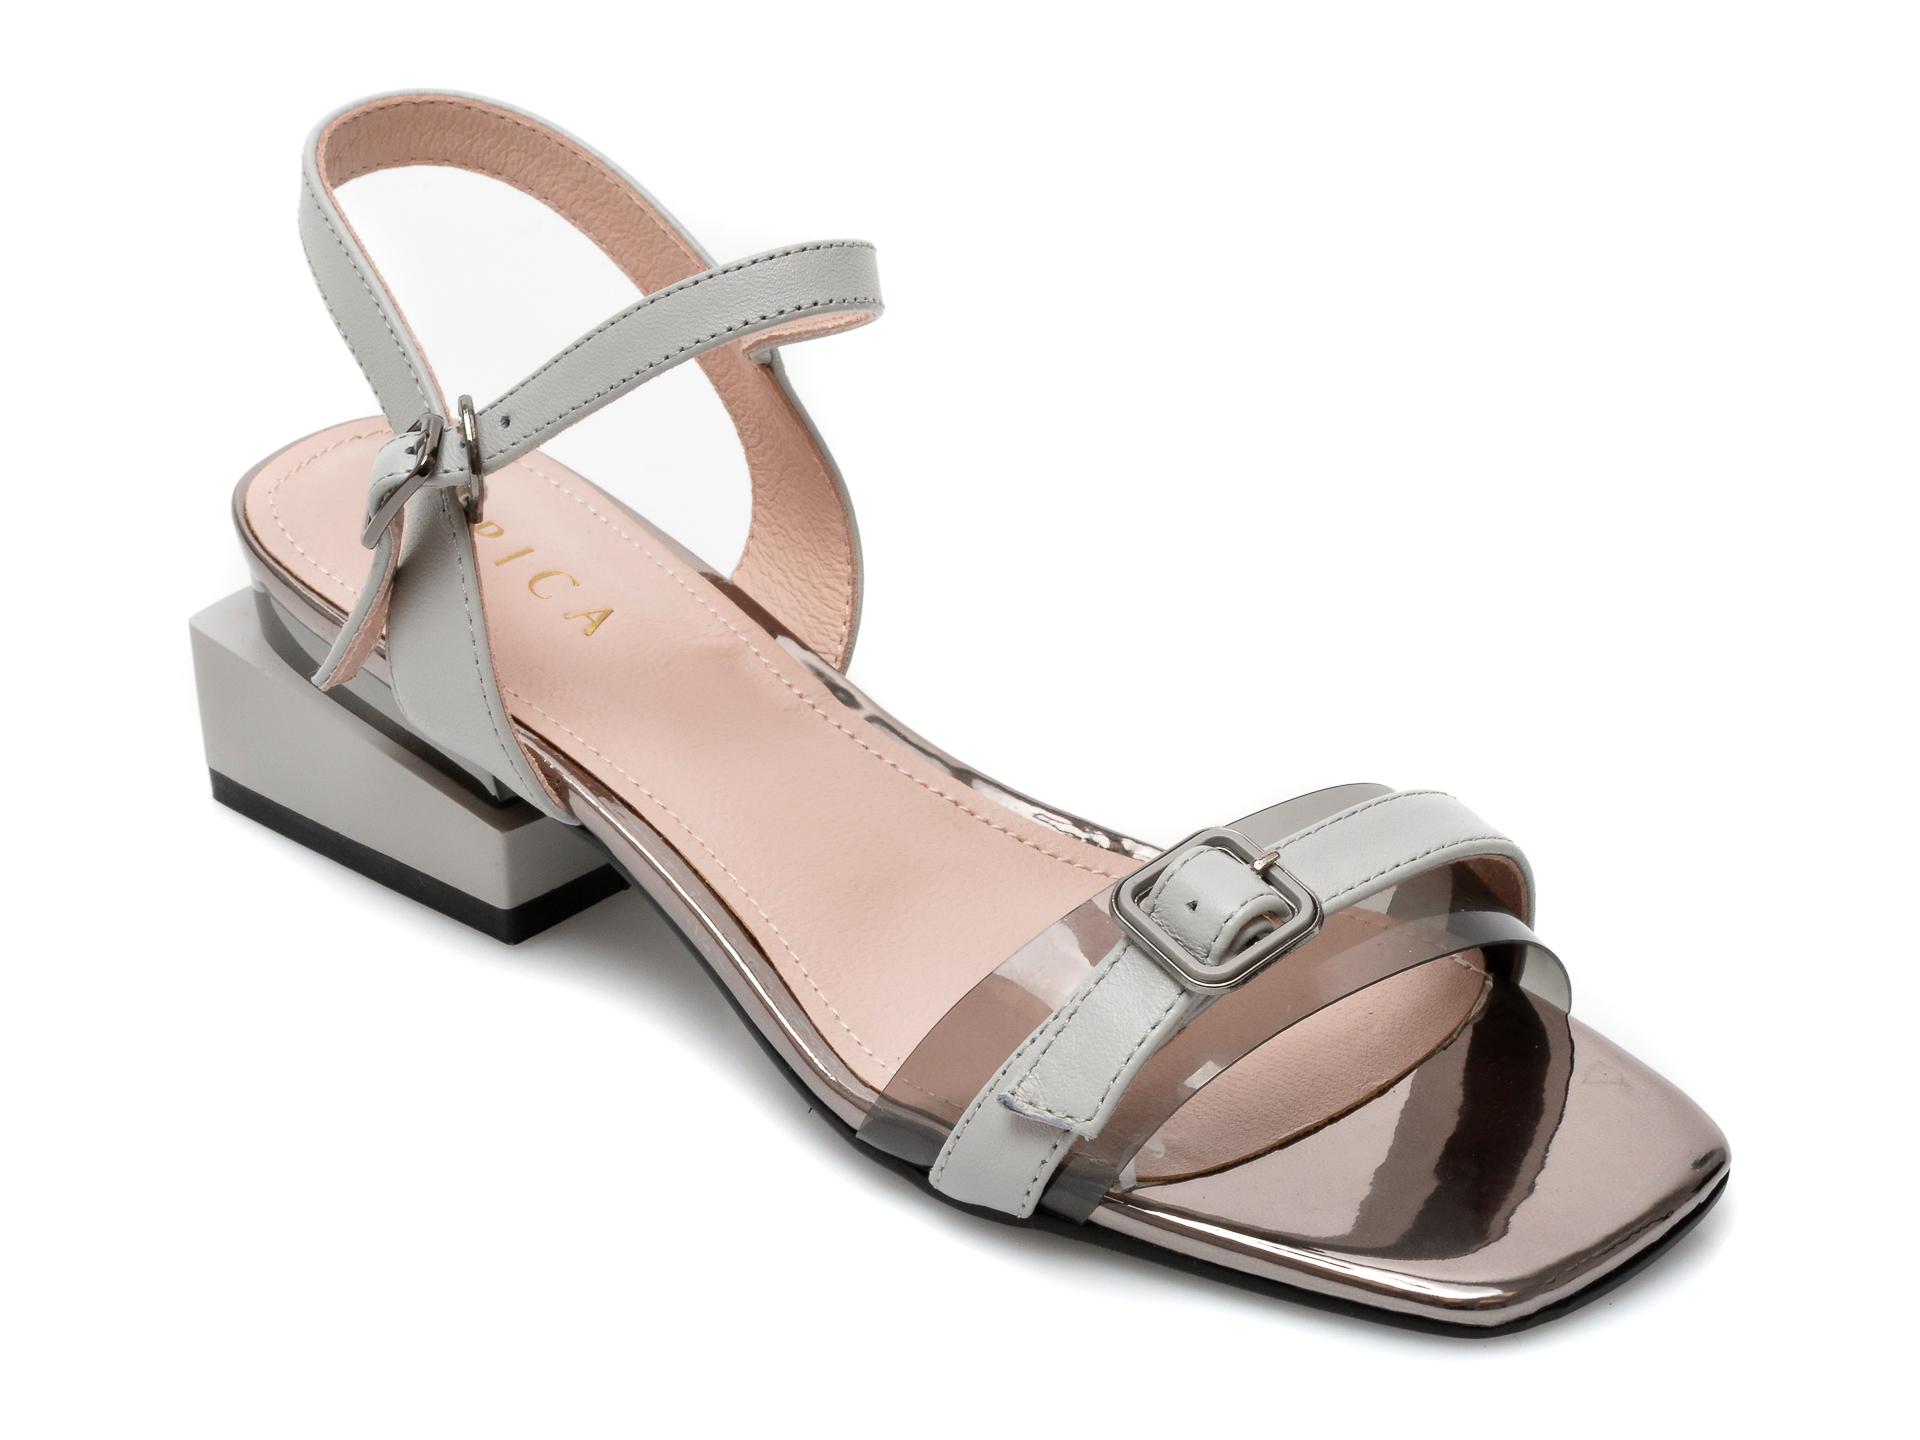 Sandale EPICA gri, 8D1355G, din piele naturala imagine otter.ro 2021